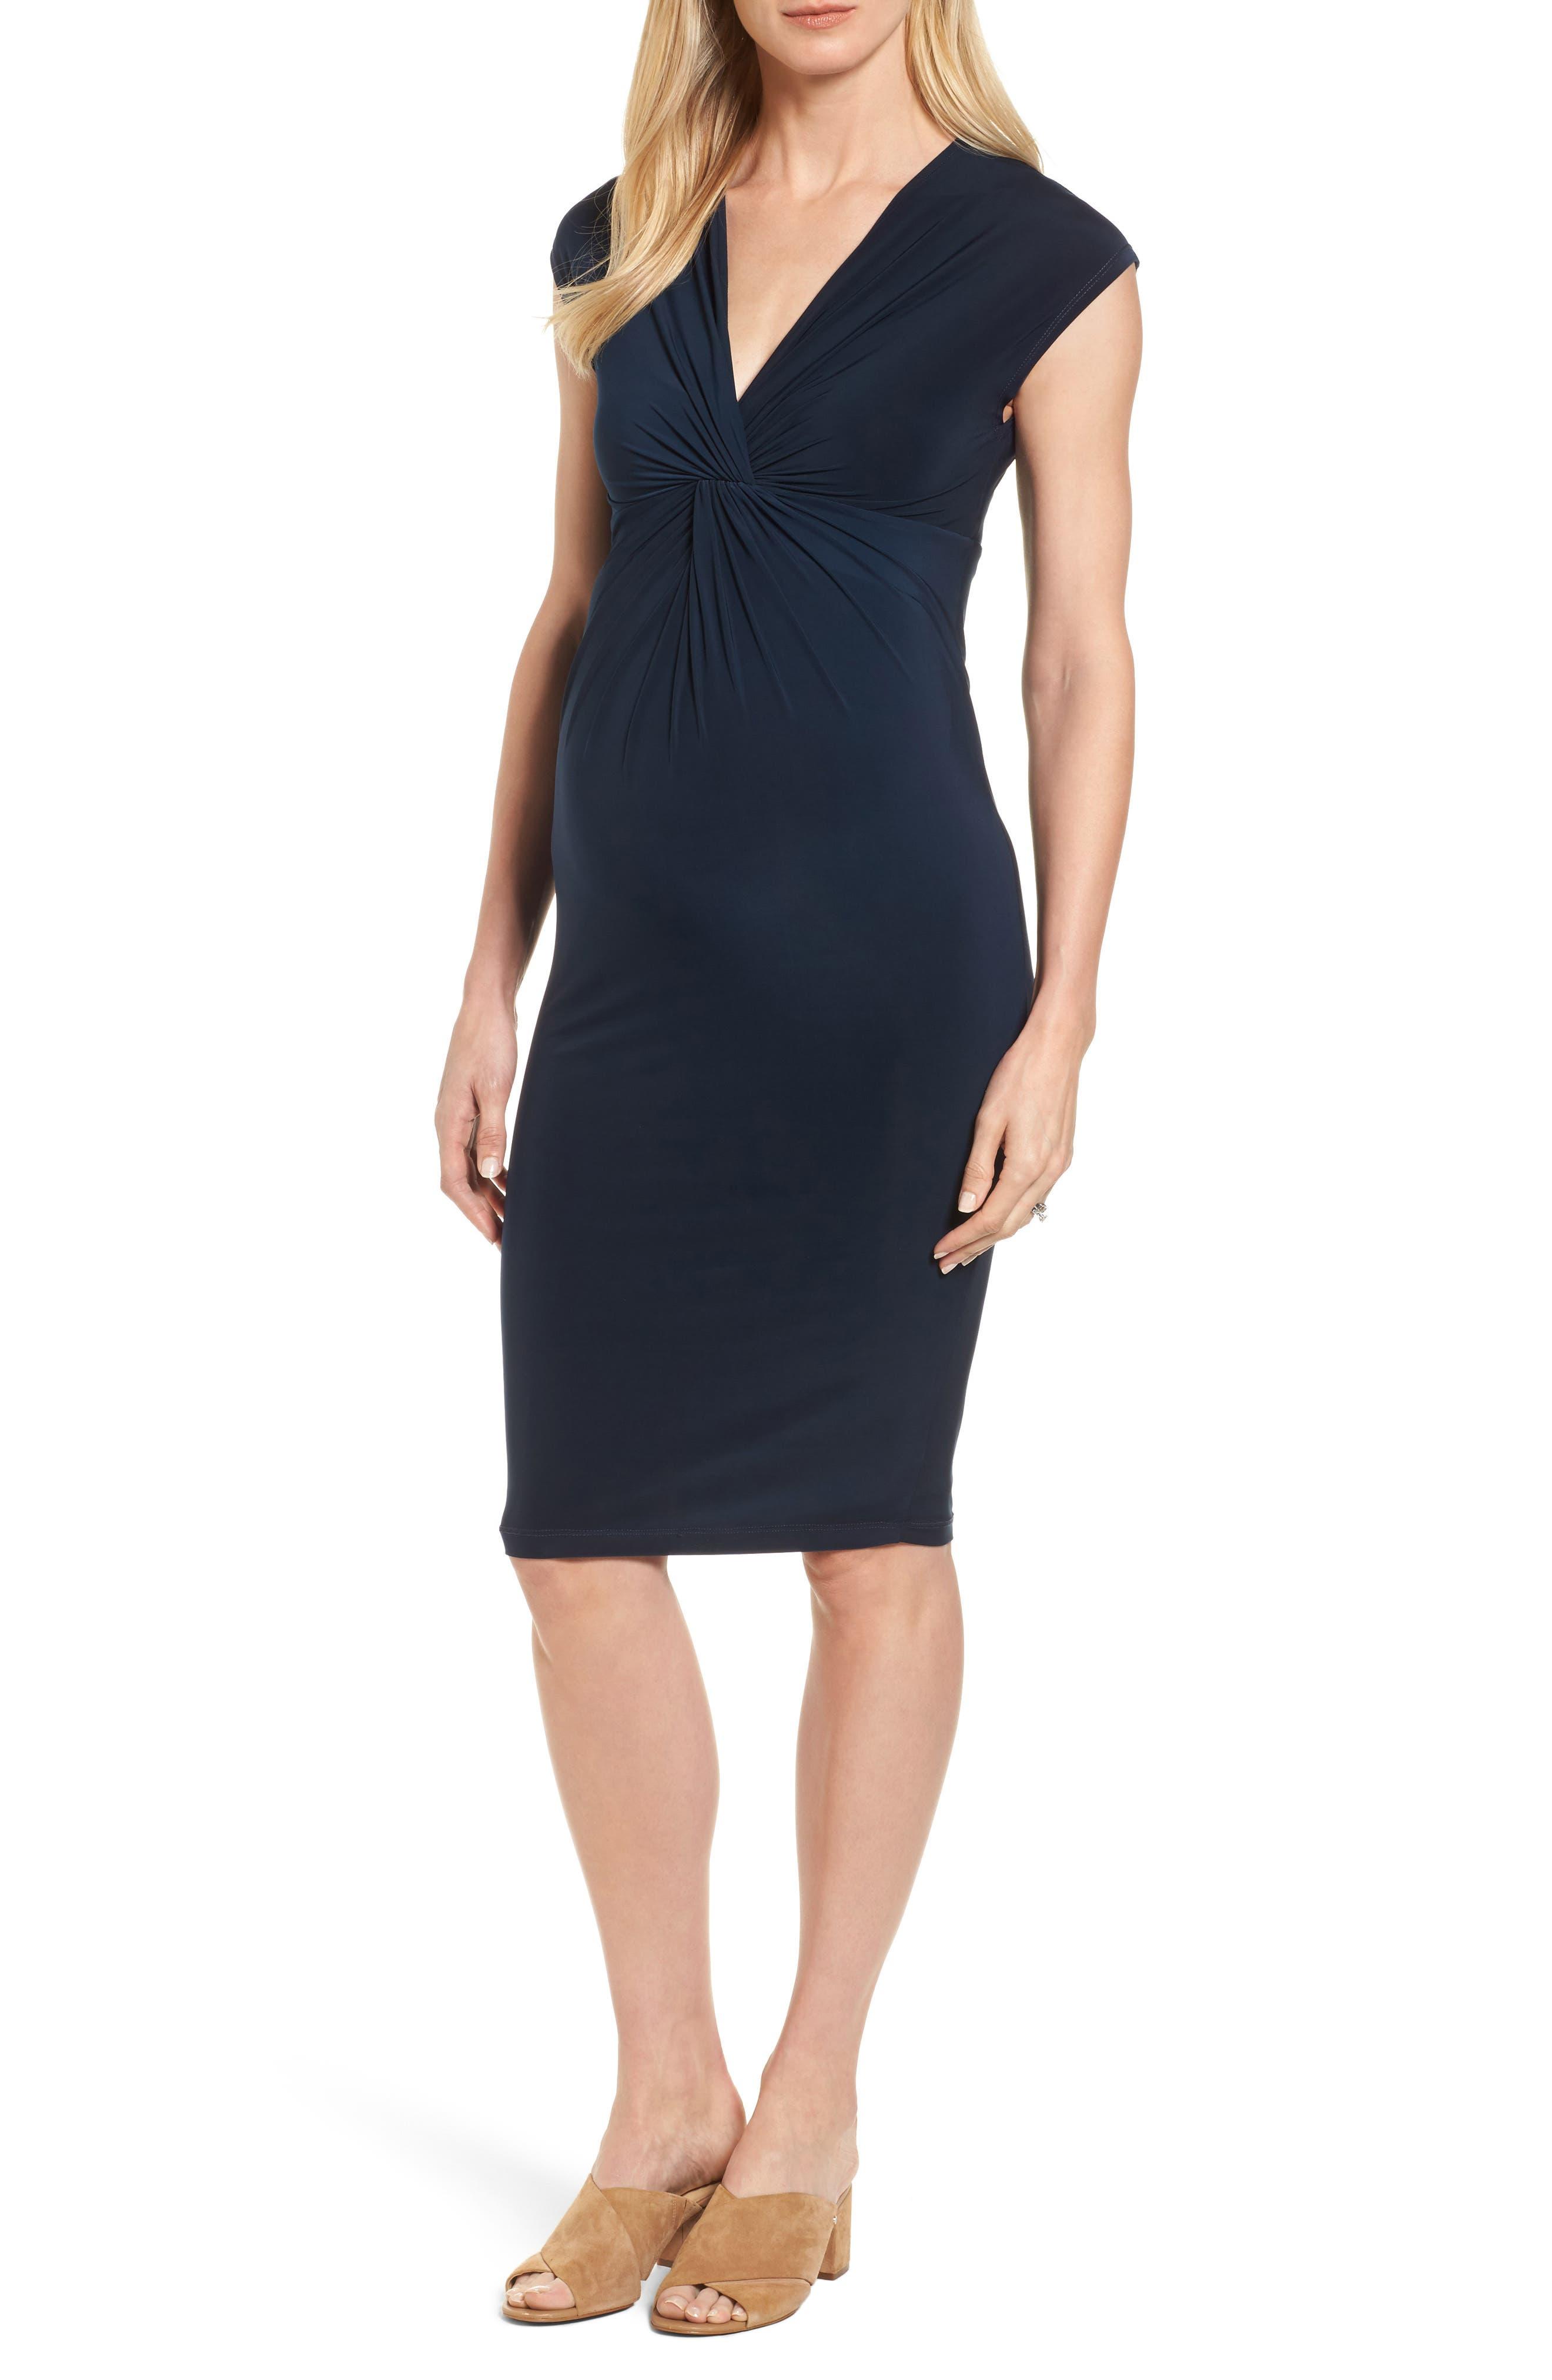 'Carla' Knot Front Jersey Maternity Dress